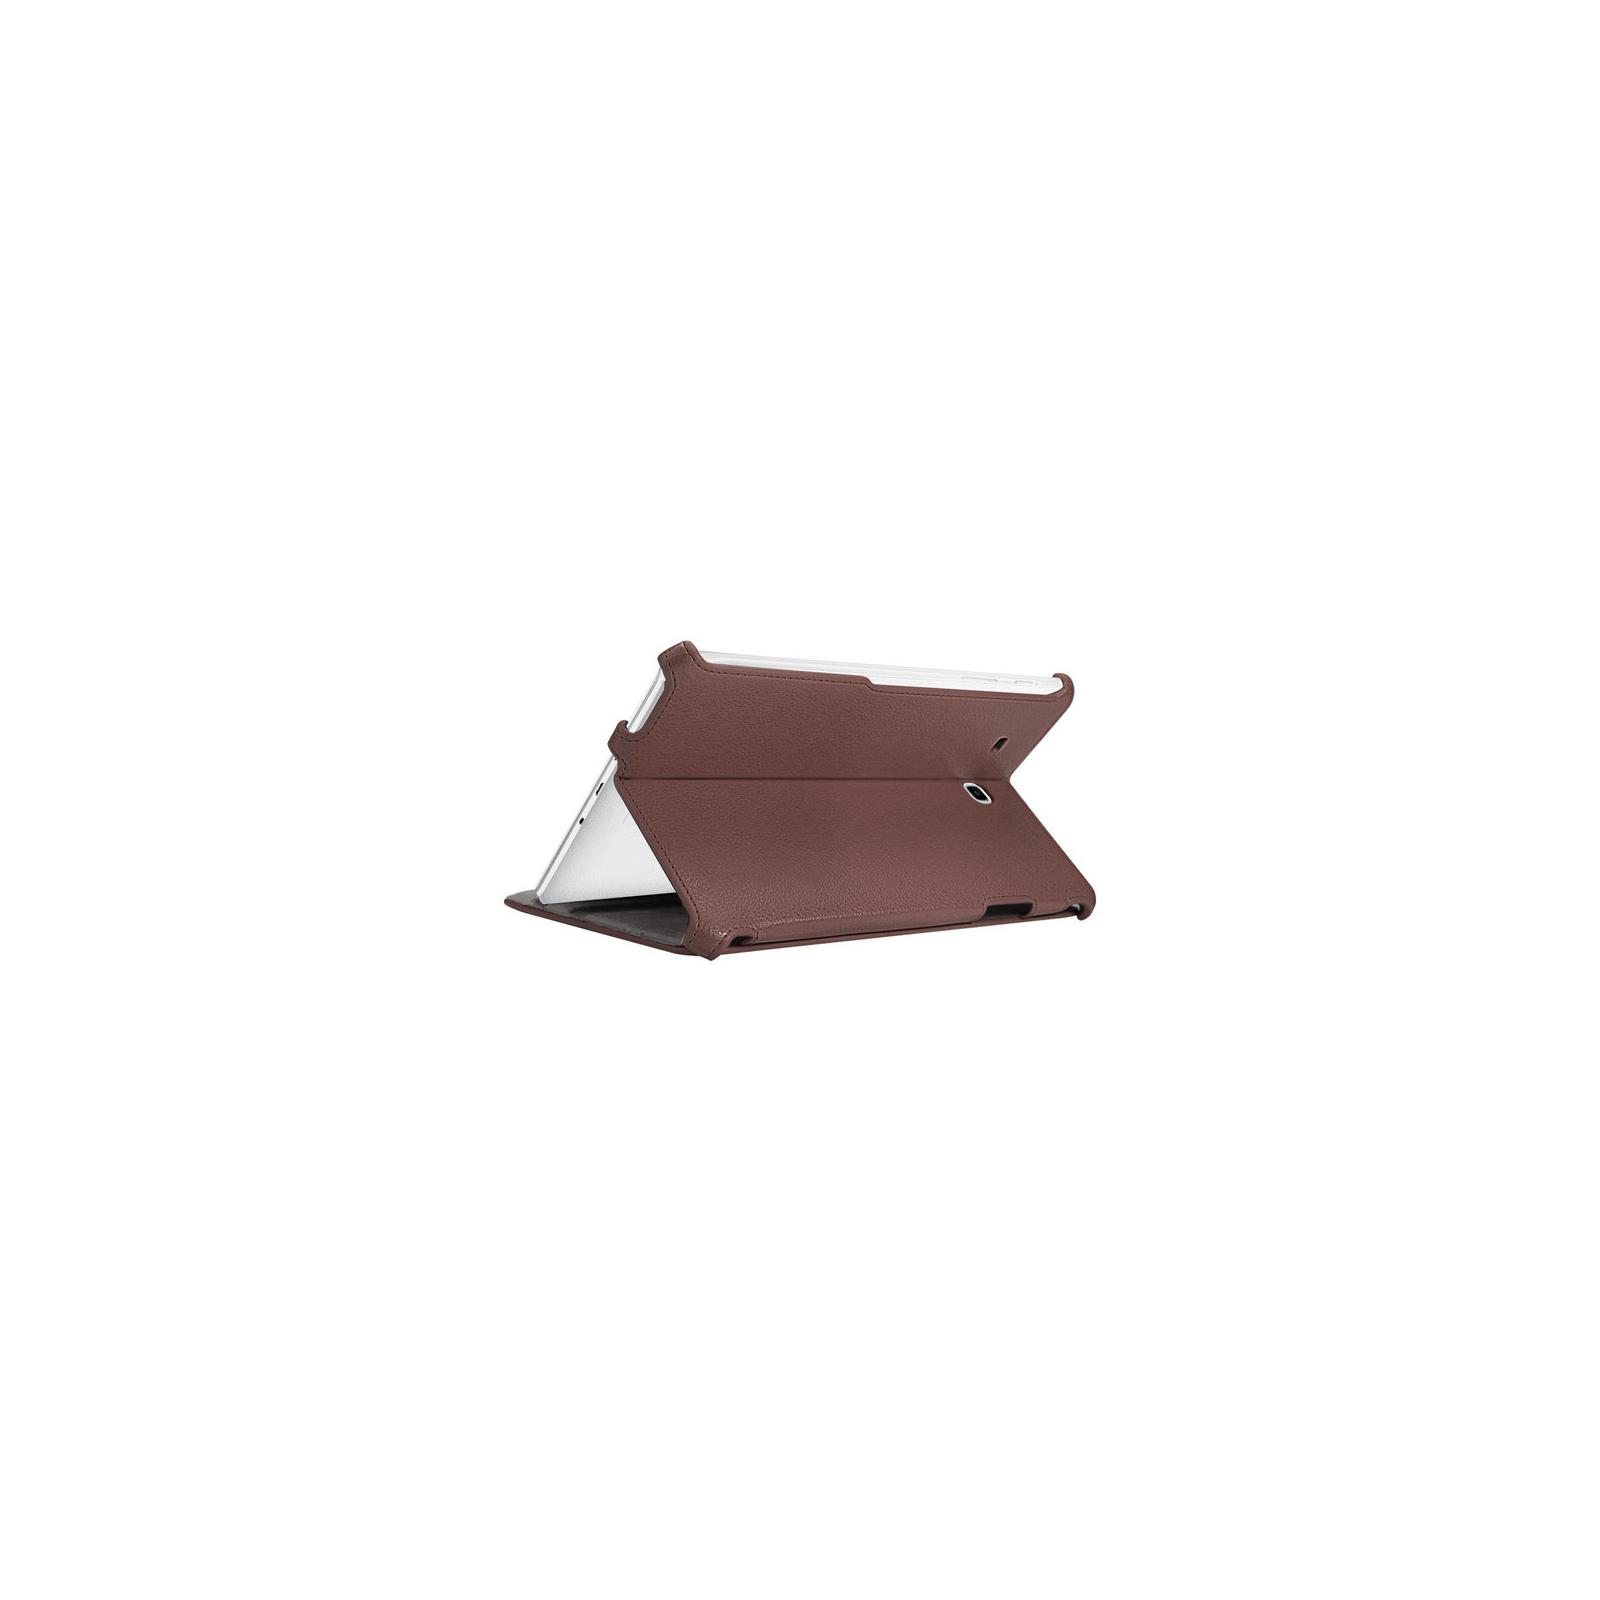 Чехол для планшета AirOn для Samsung Galaxy Tab E 9.6 brown (4822352777128) изображение 7